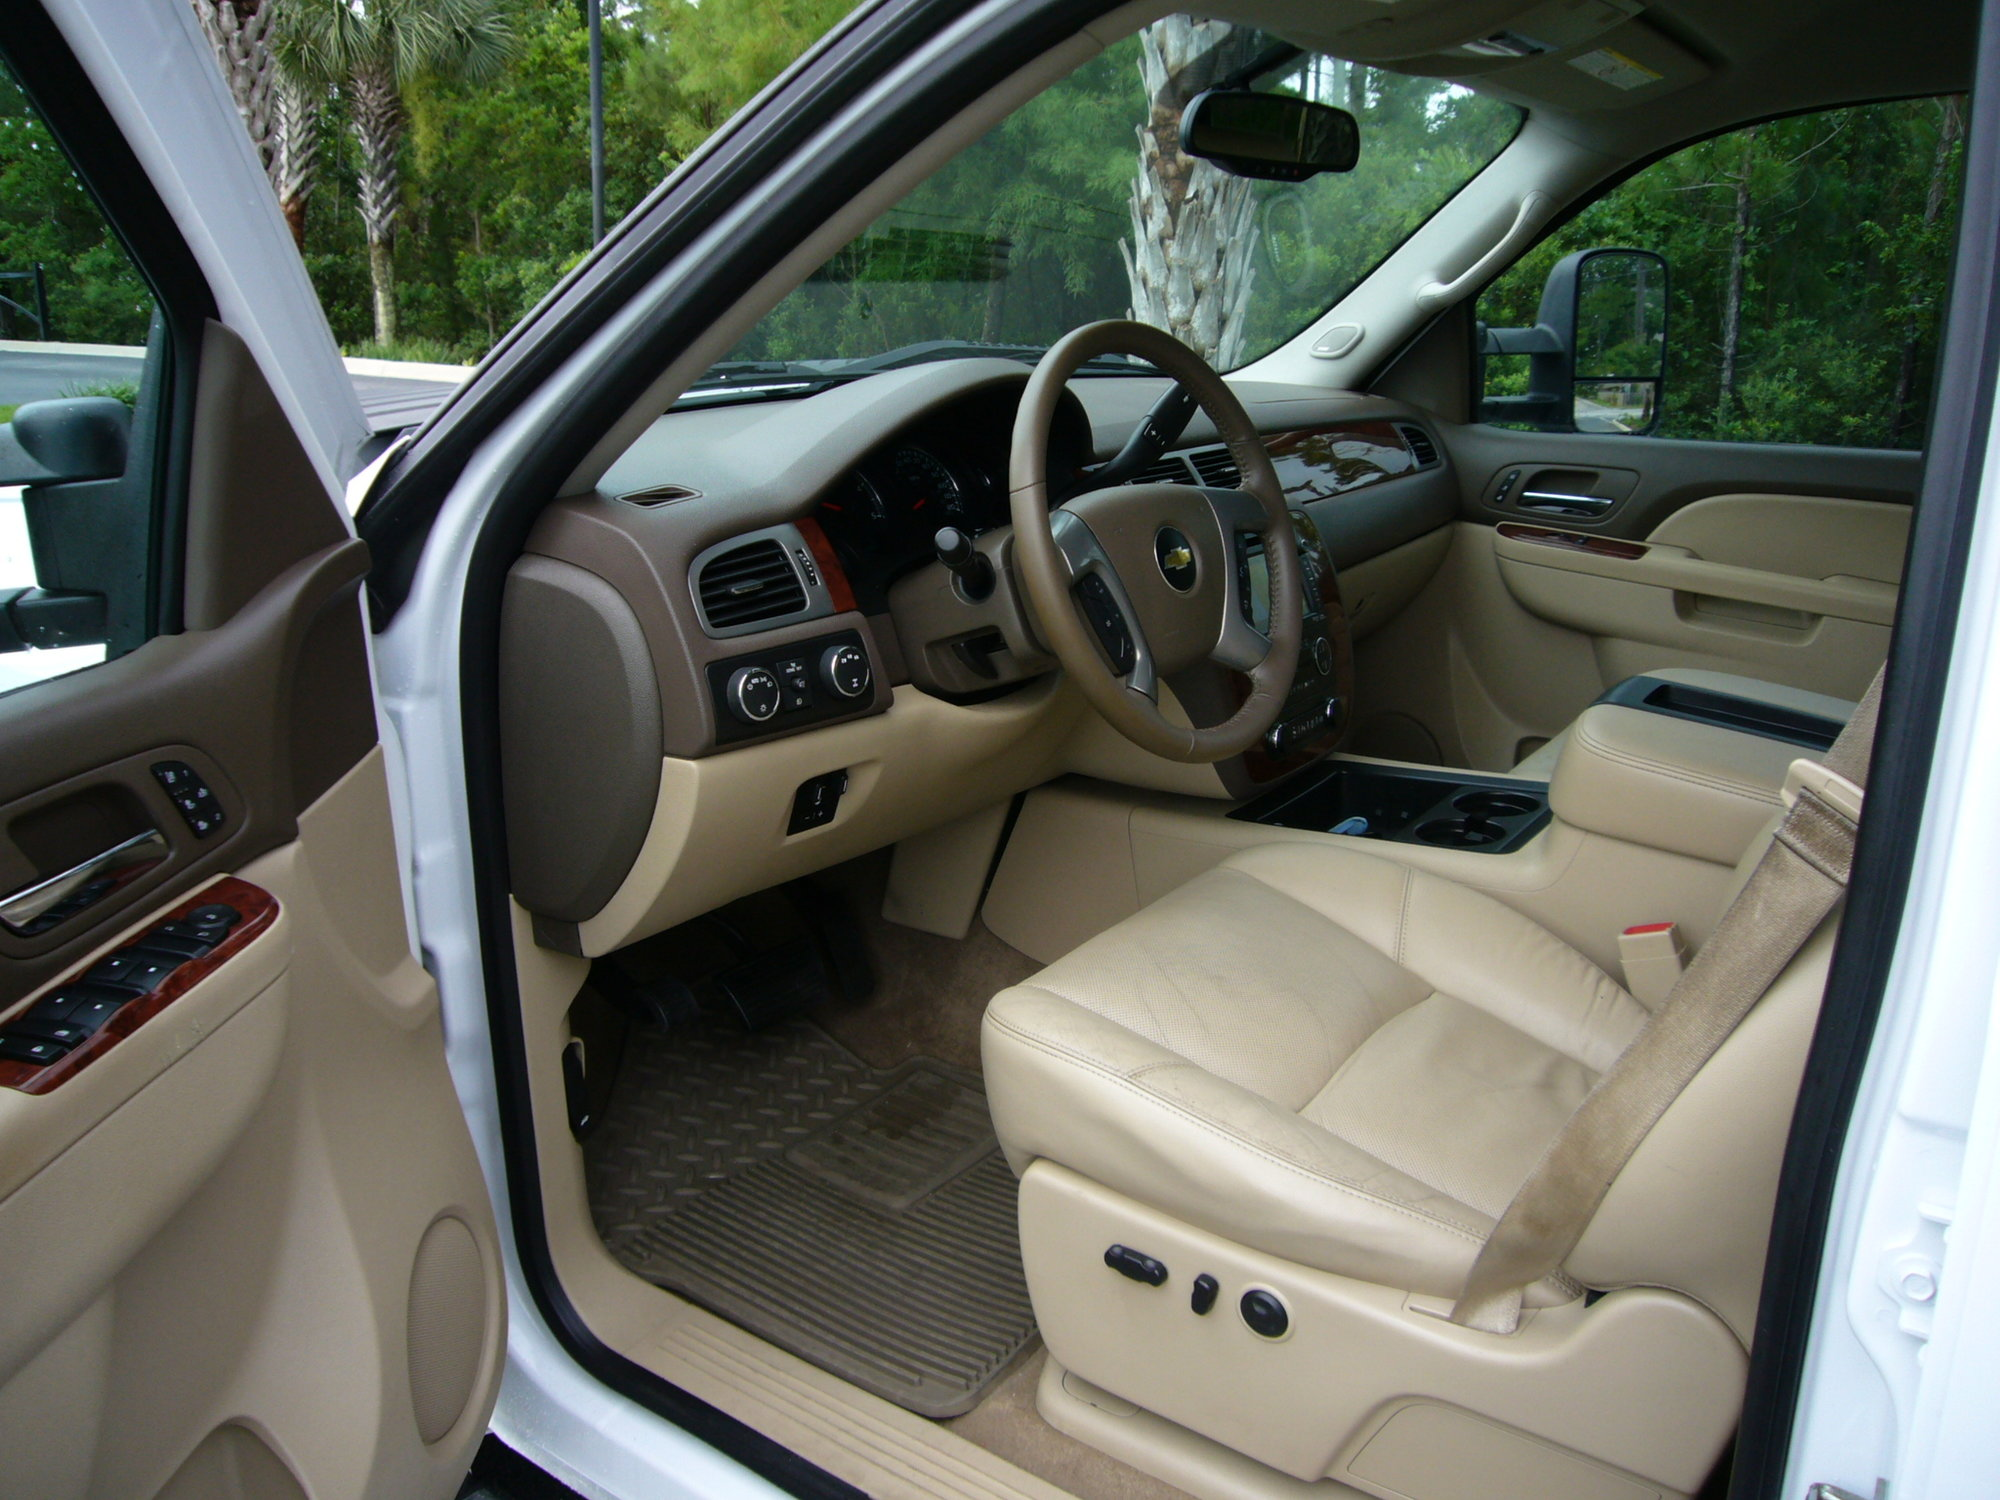 2014 Chevy Silverado Crew Cab LTZ 2500HD Duramax Diesel Z71 4x4 -REDUCED- - The Hull Truth ...